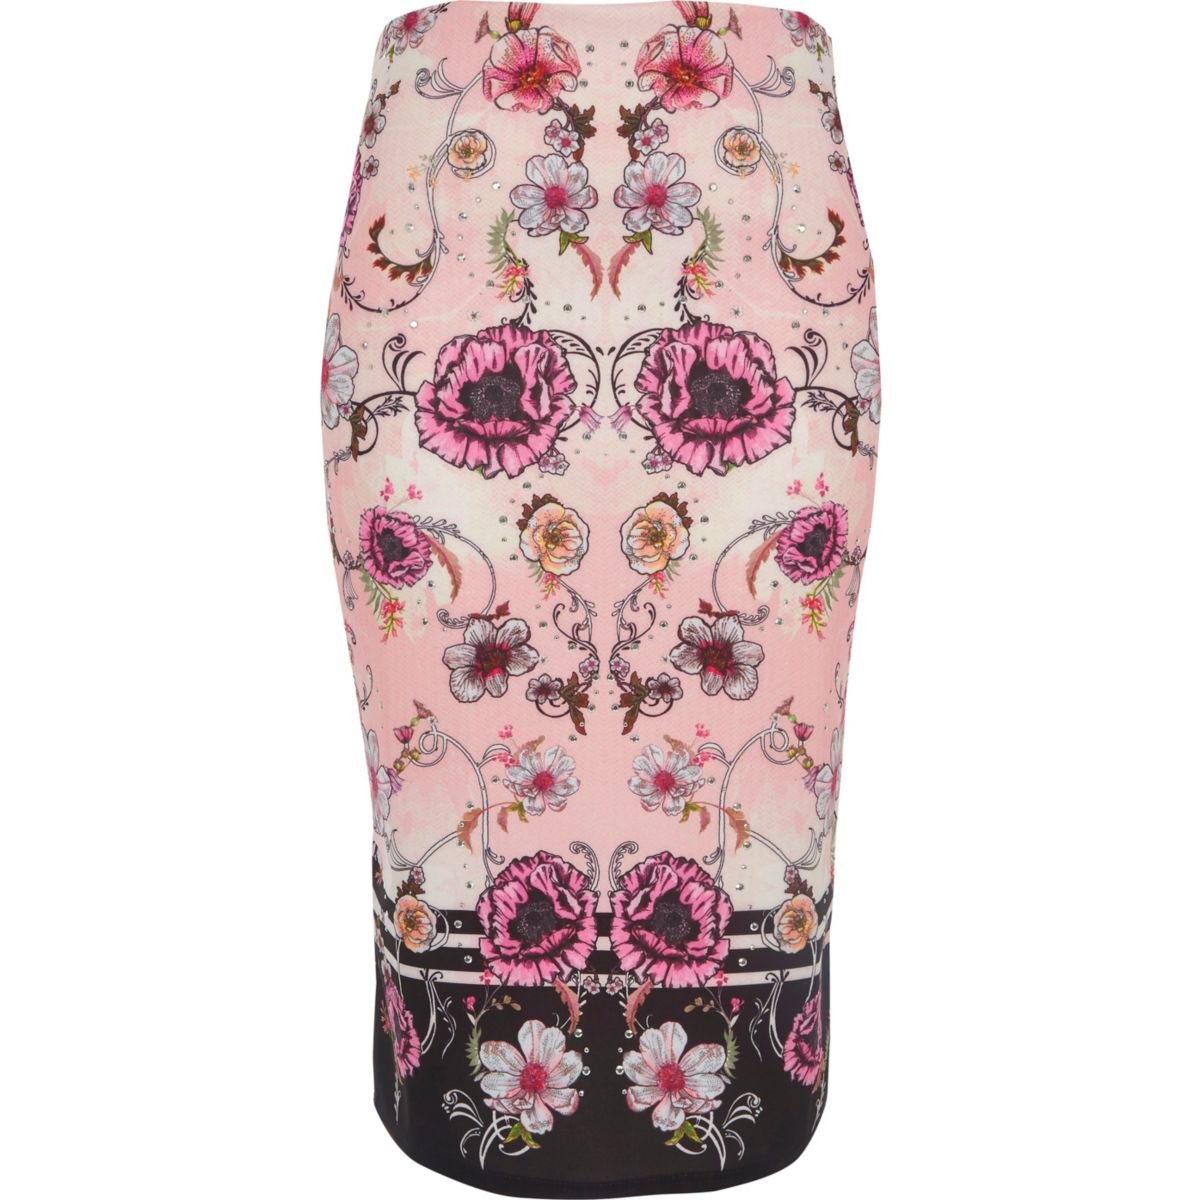 Pink floral print pencil skirt